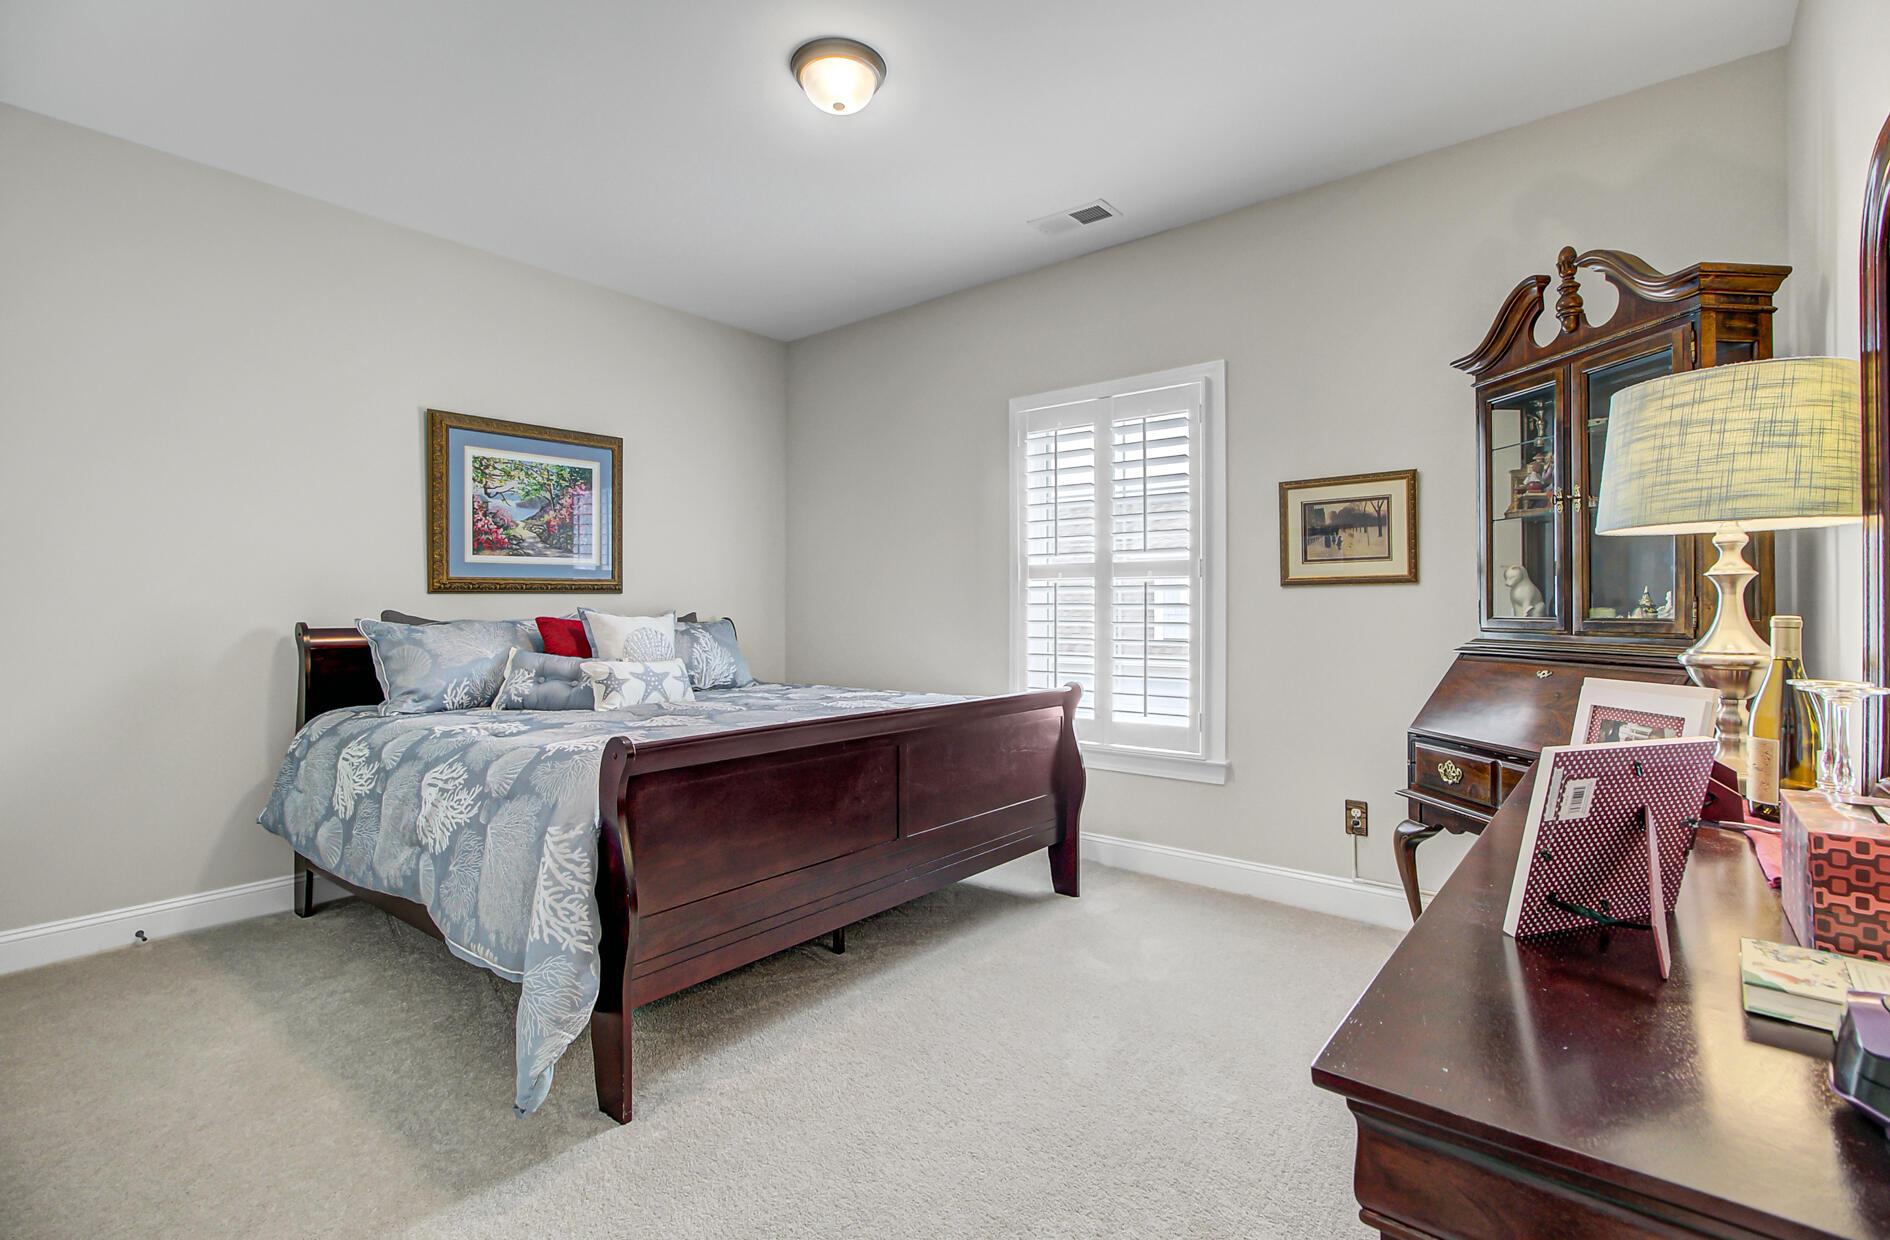 Park West Homes For Sale - 2824 Wagner, Mount Pleasant, SC - 28